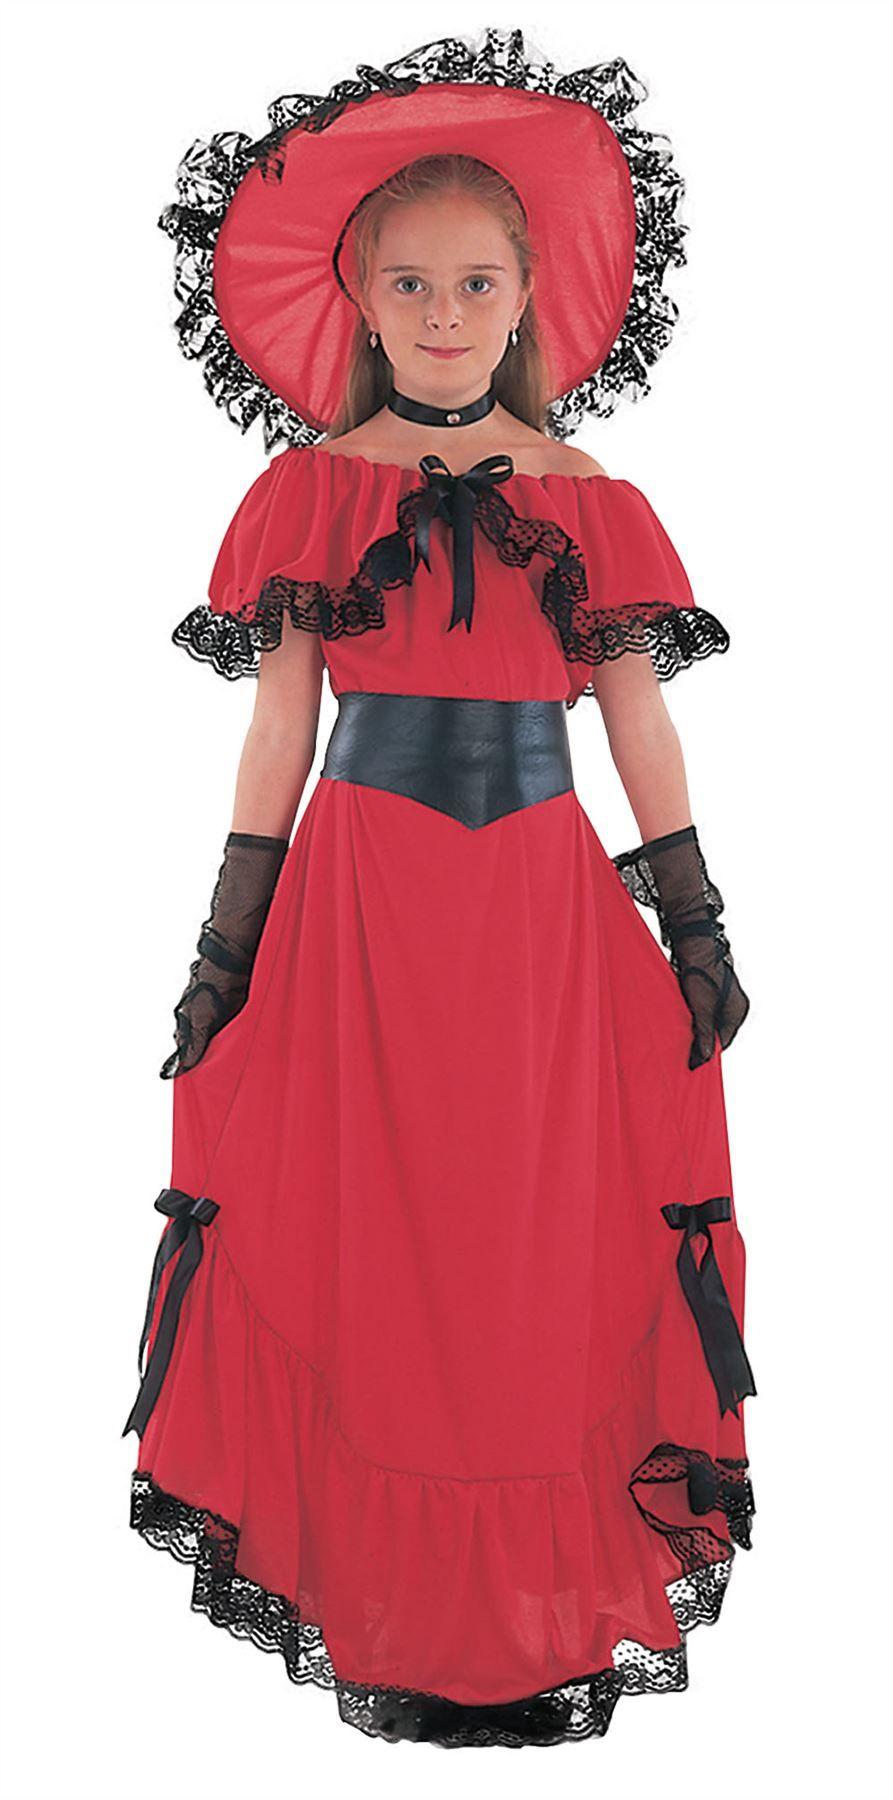 GIRLS SCARLET O HARA WESTERN VICTORIAN FANCY DRESS COSTUME